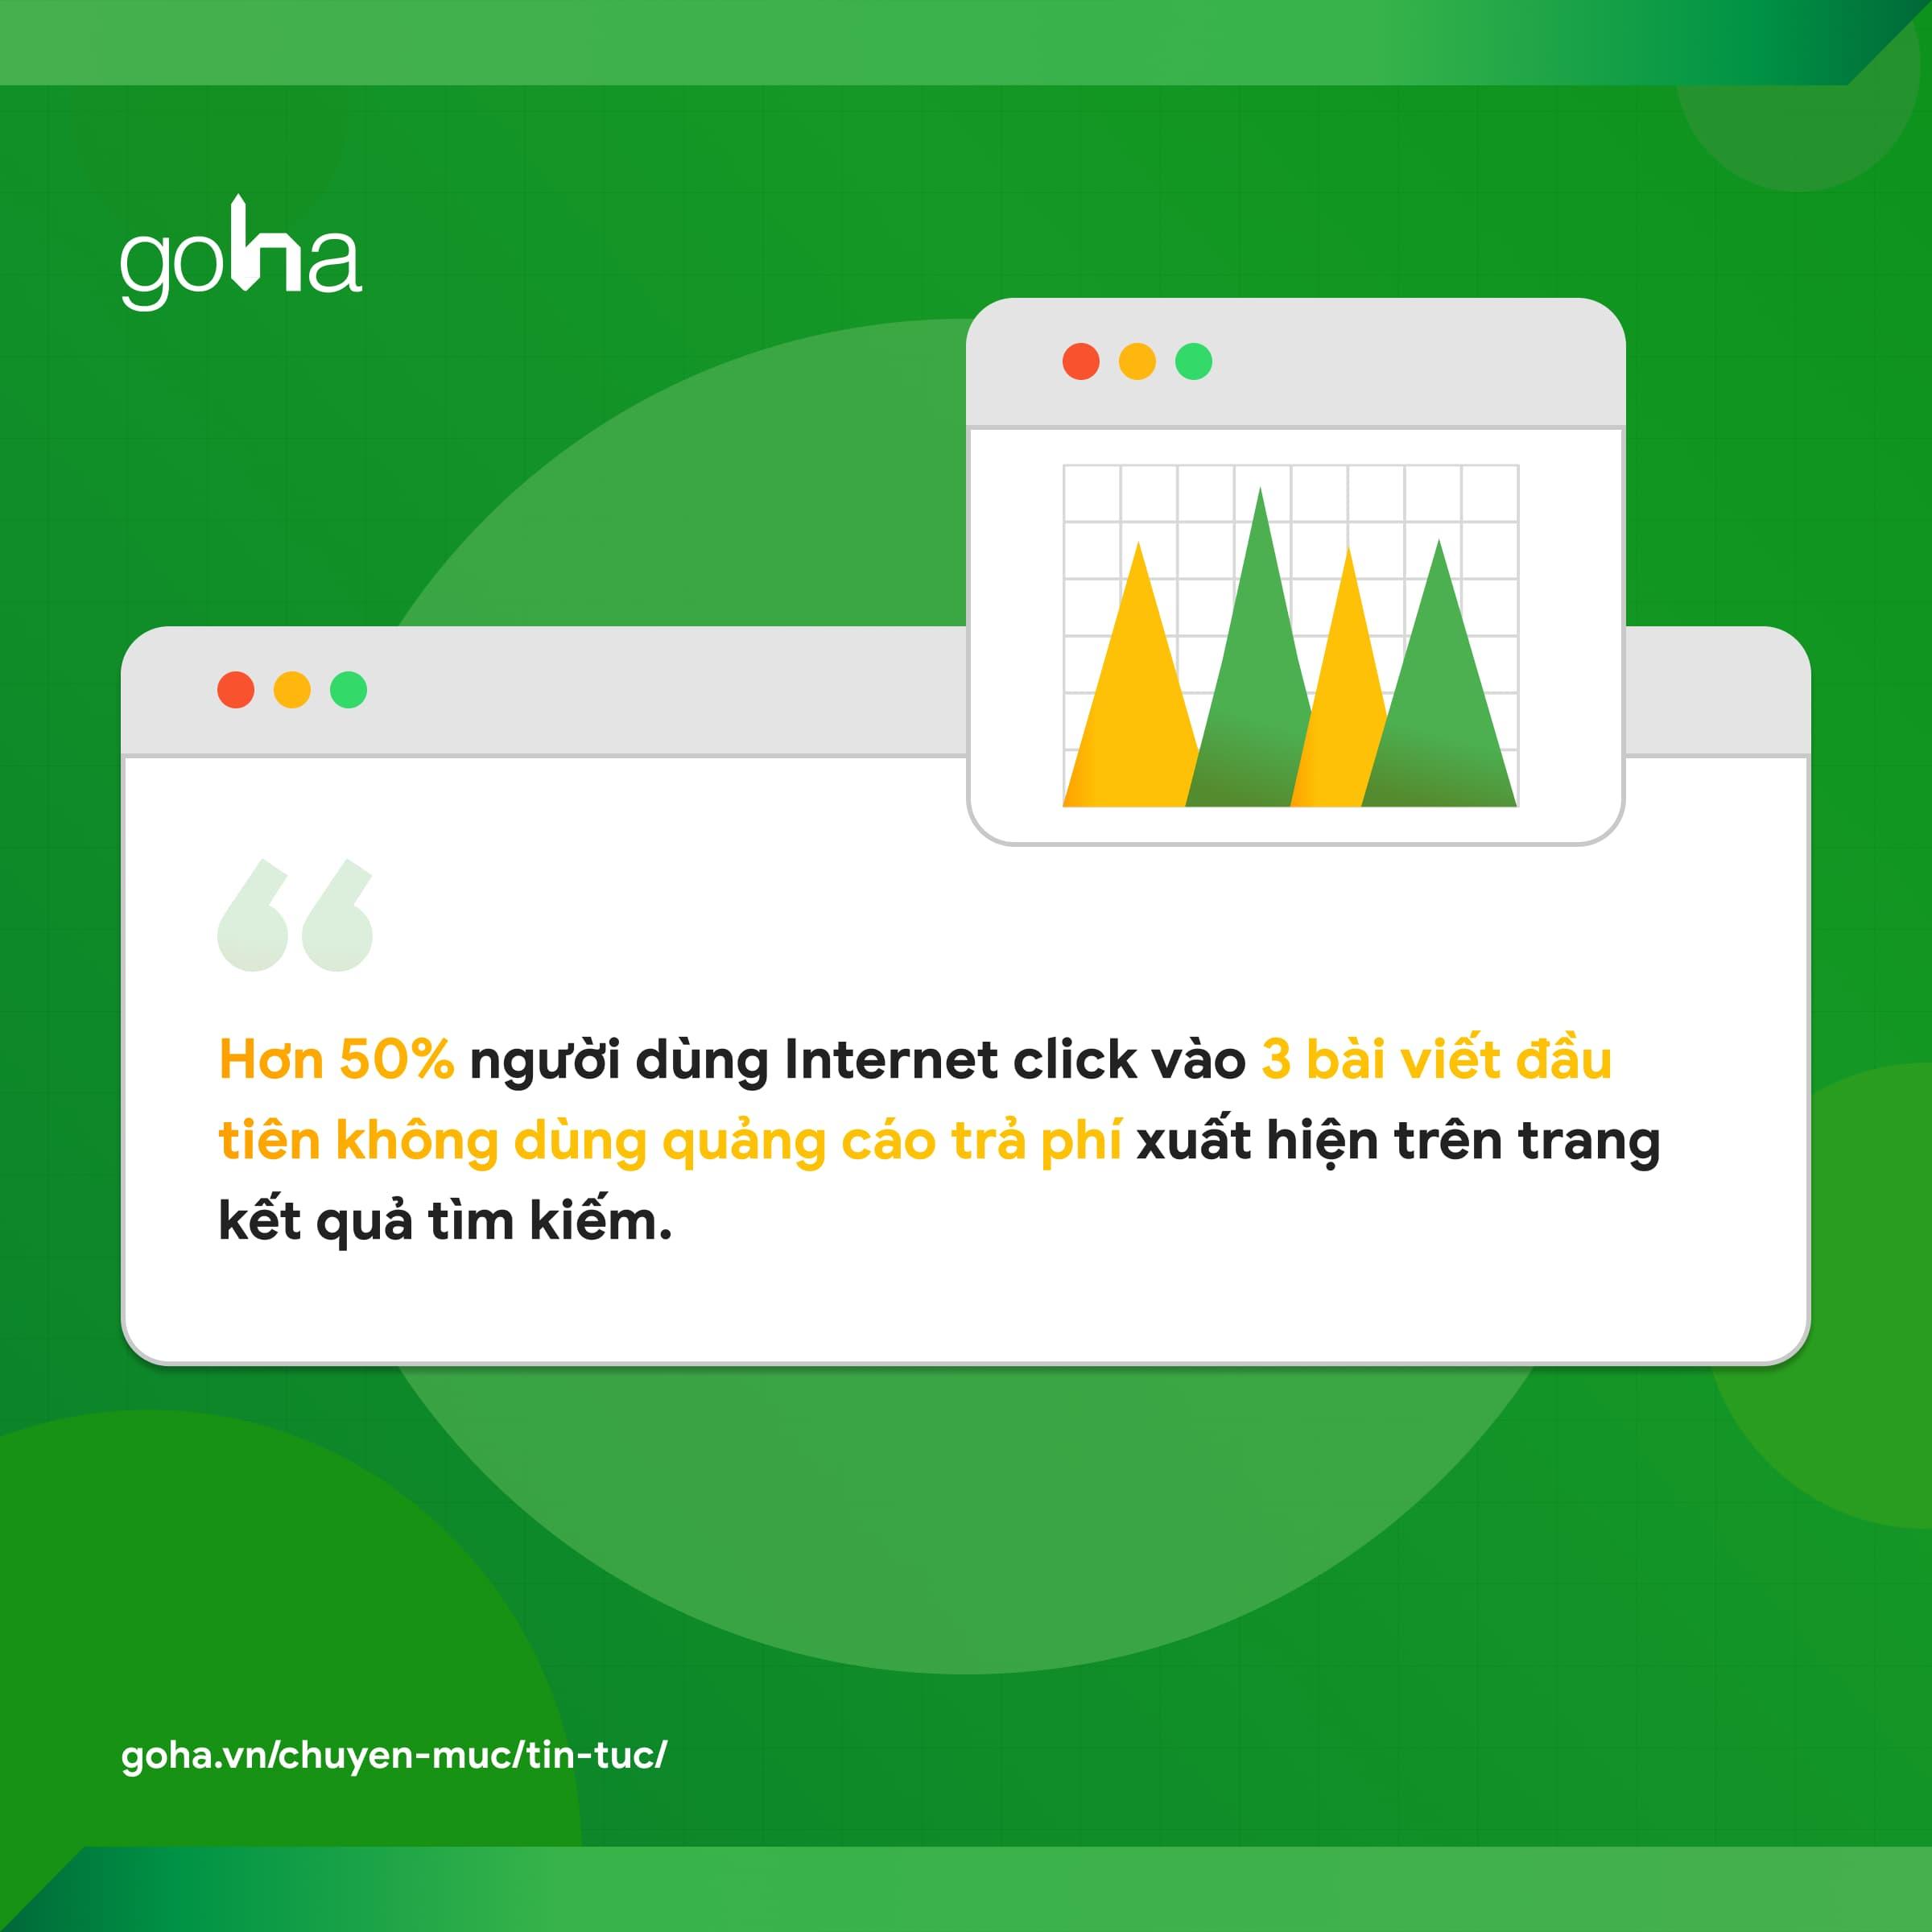 nguoi-dung-internet-co-xu-huong-click-vao-cac-bai-viet-xuat-hien-o-trang-dau